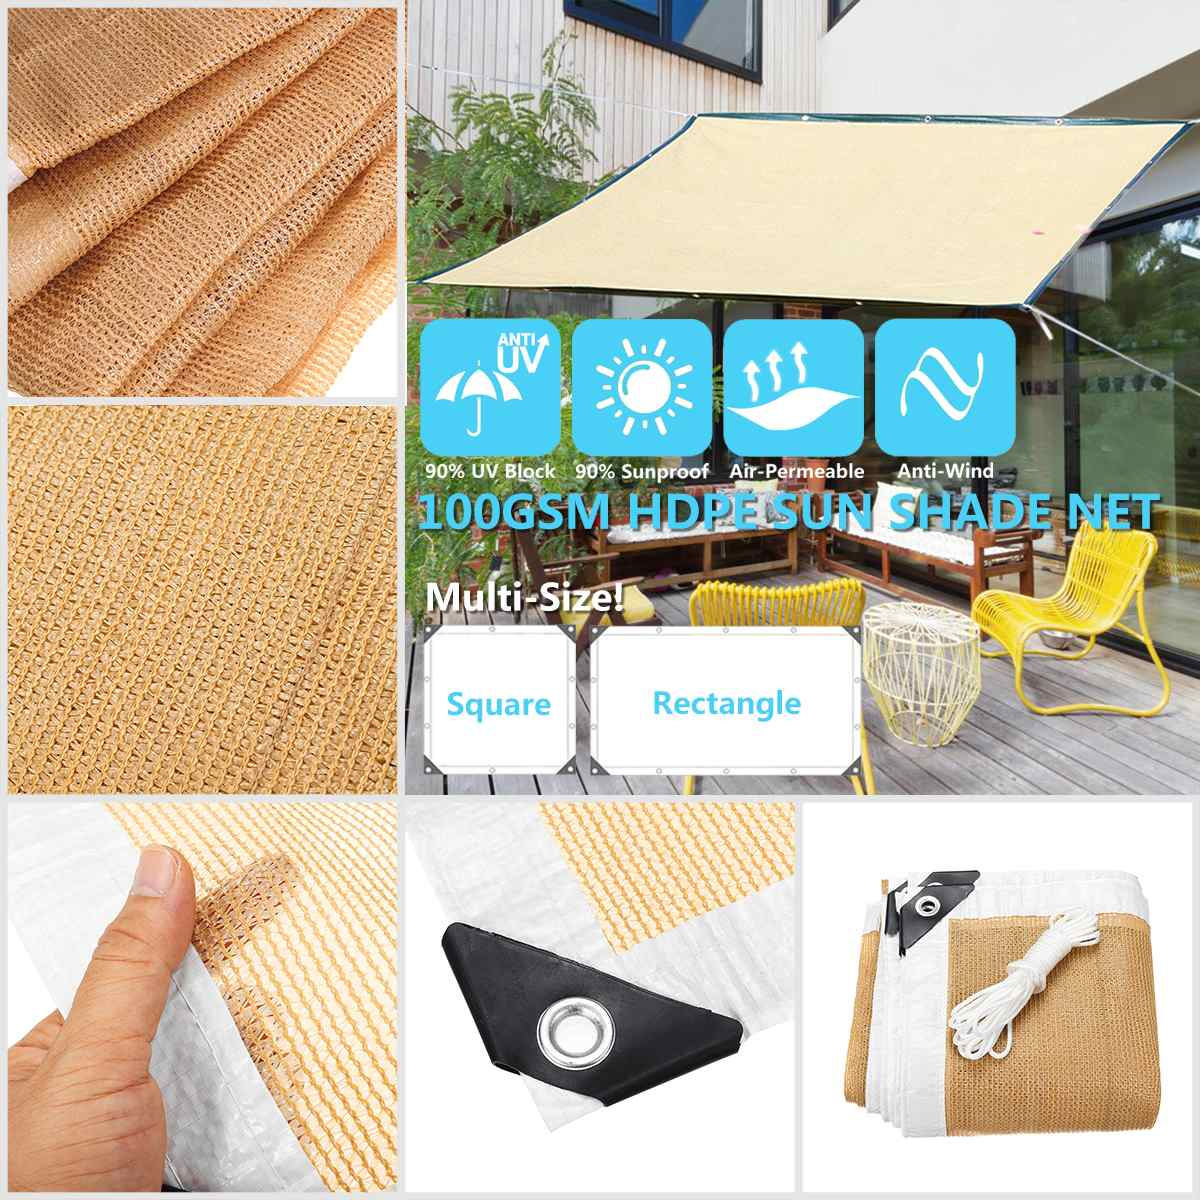 Outdoor sun shade sail garden netting 2 Sizes HDPE Anti-UV sunblock Netting